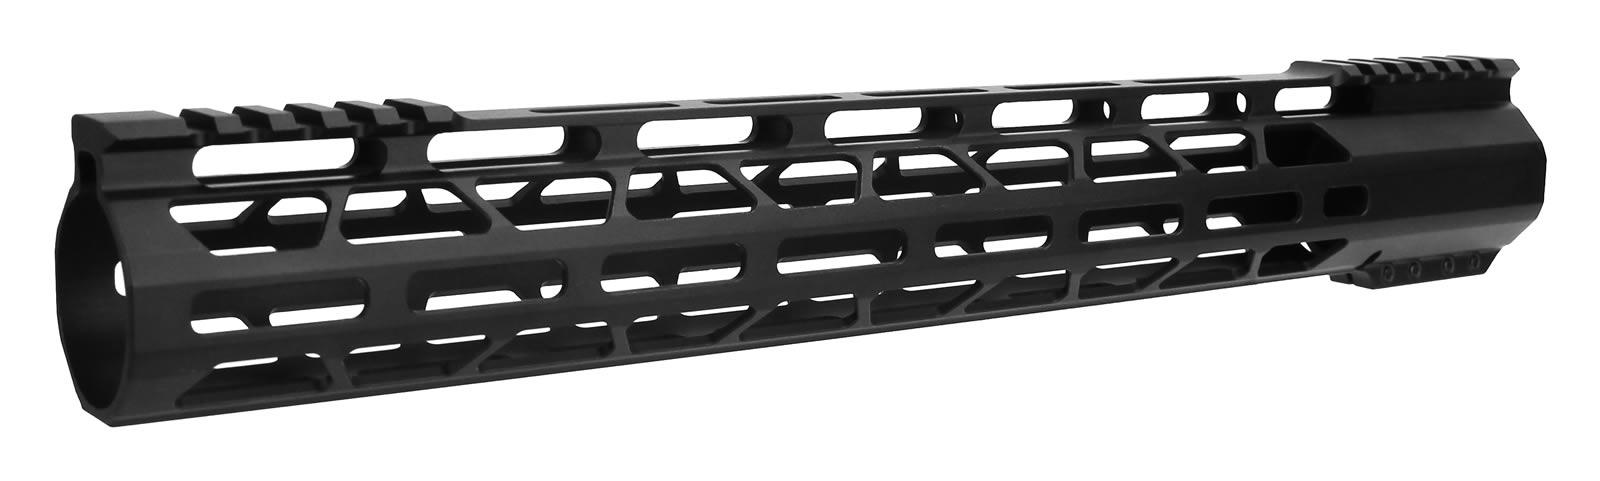 Ar 10 Rail Cbc Gen 3 15 308 Ultra Slim M Lok Free Float Clamp On